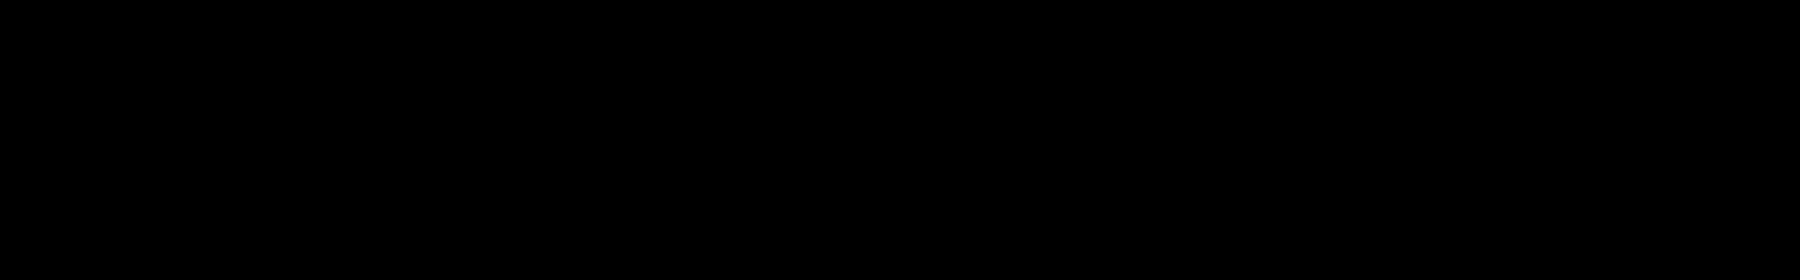 909 - TR-909 Culture audio waveform